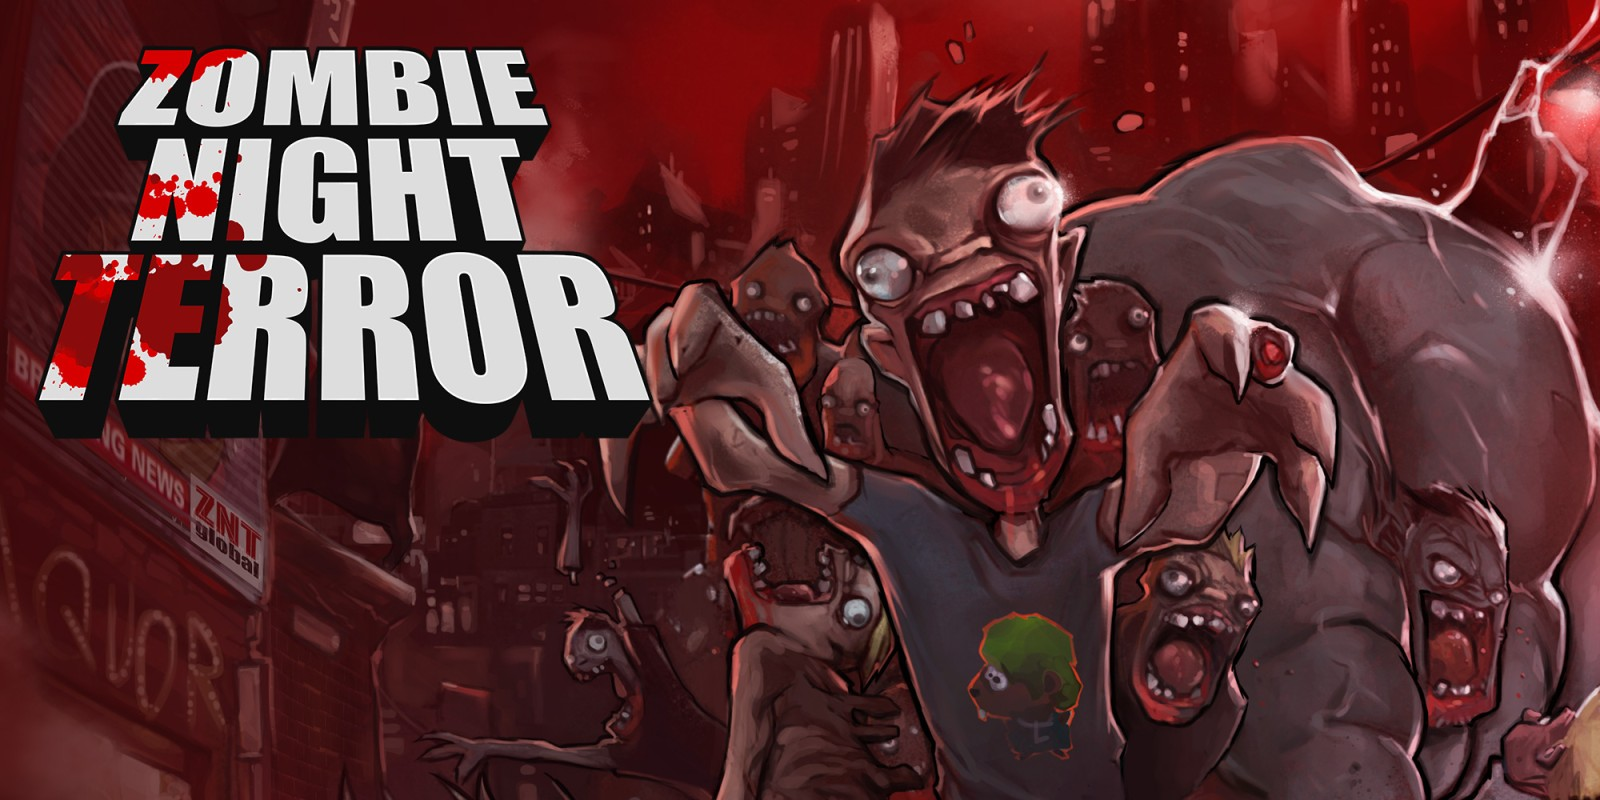 Zombie Night Terror 2152019 1